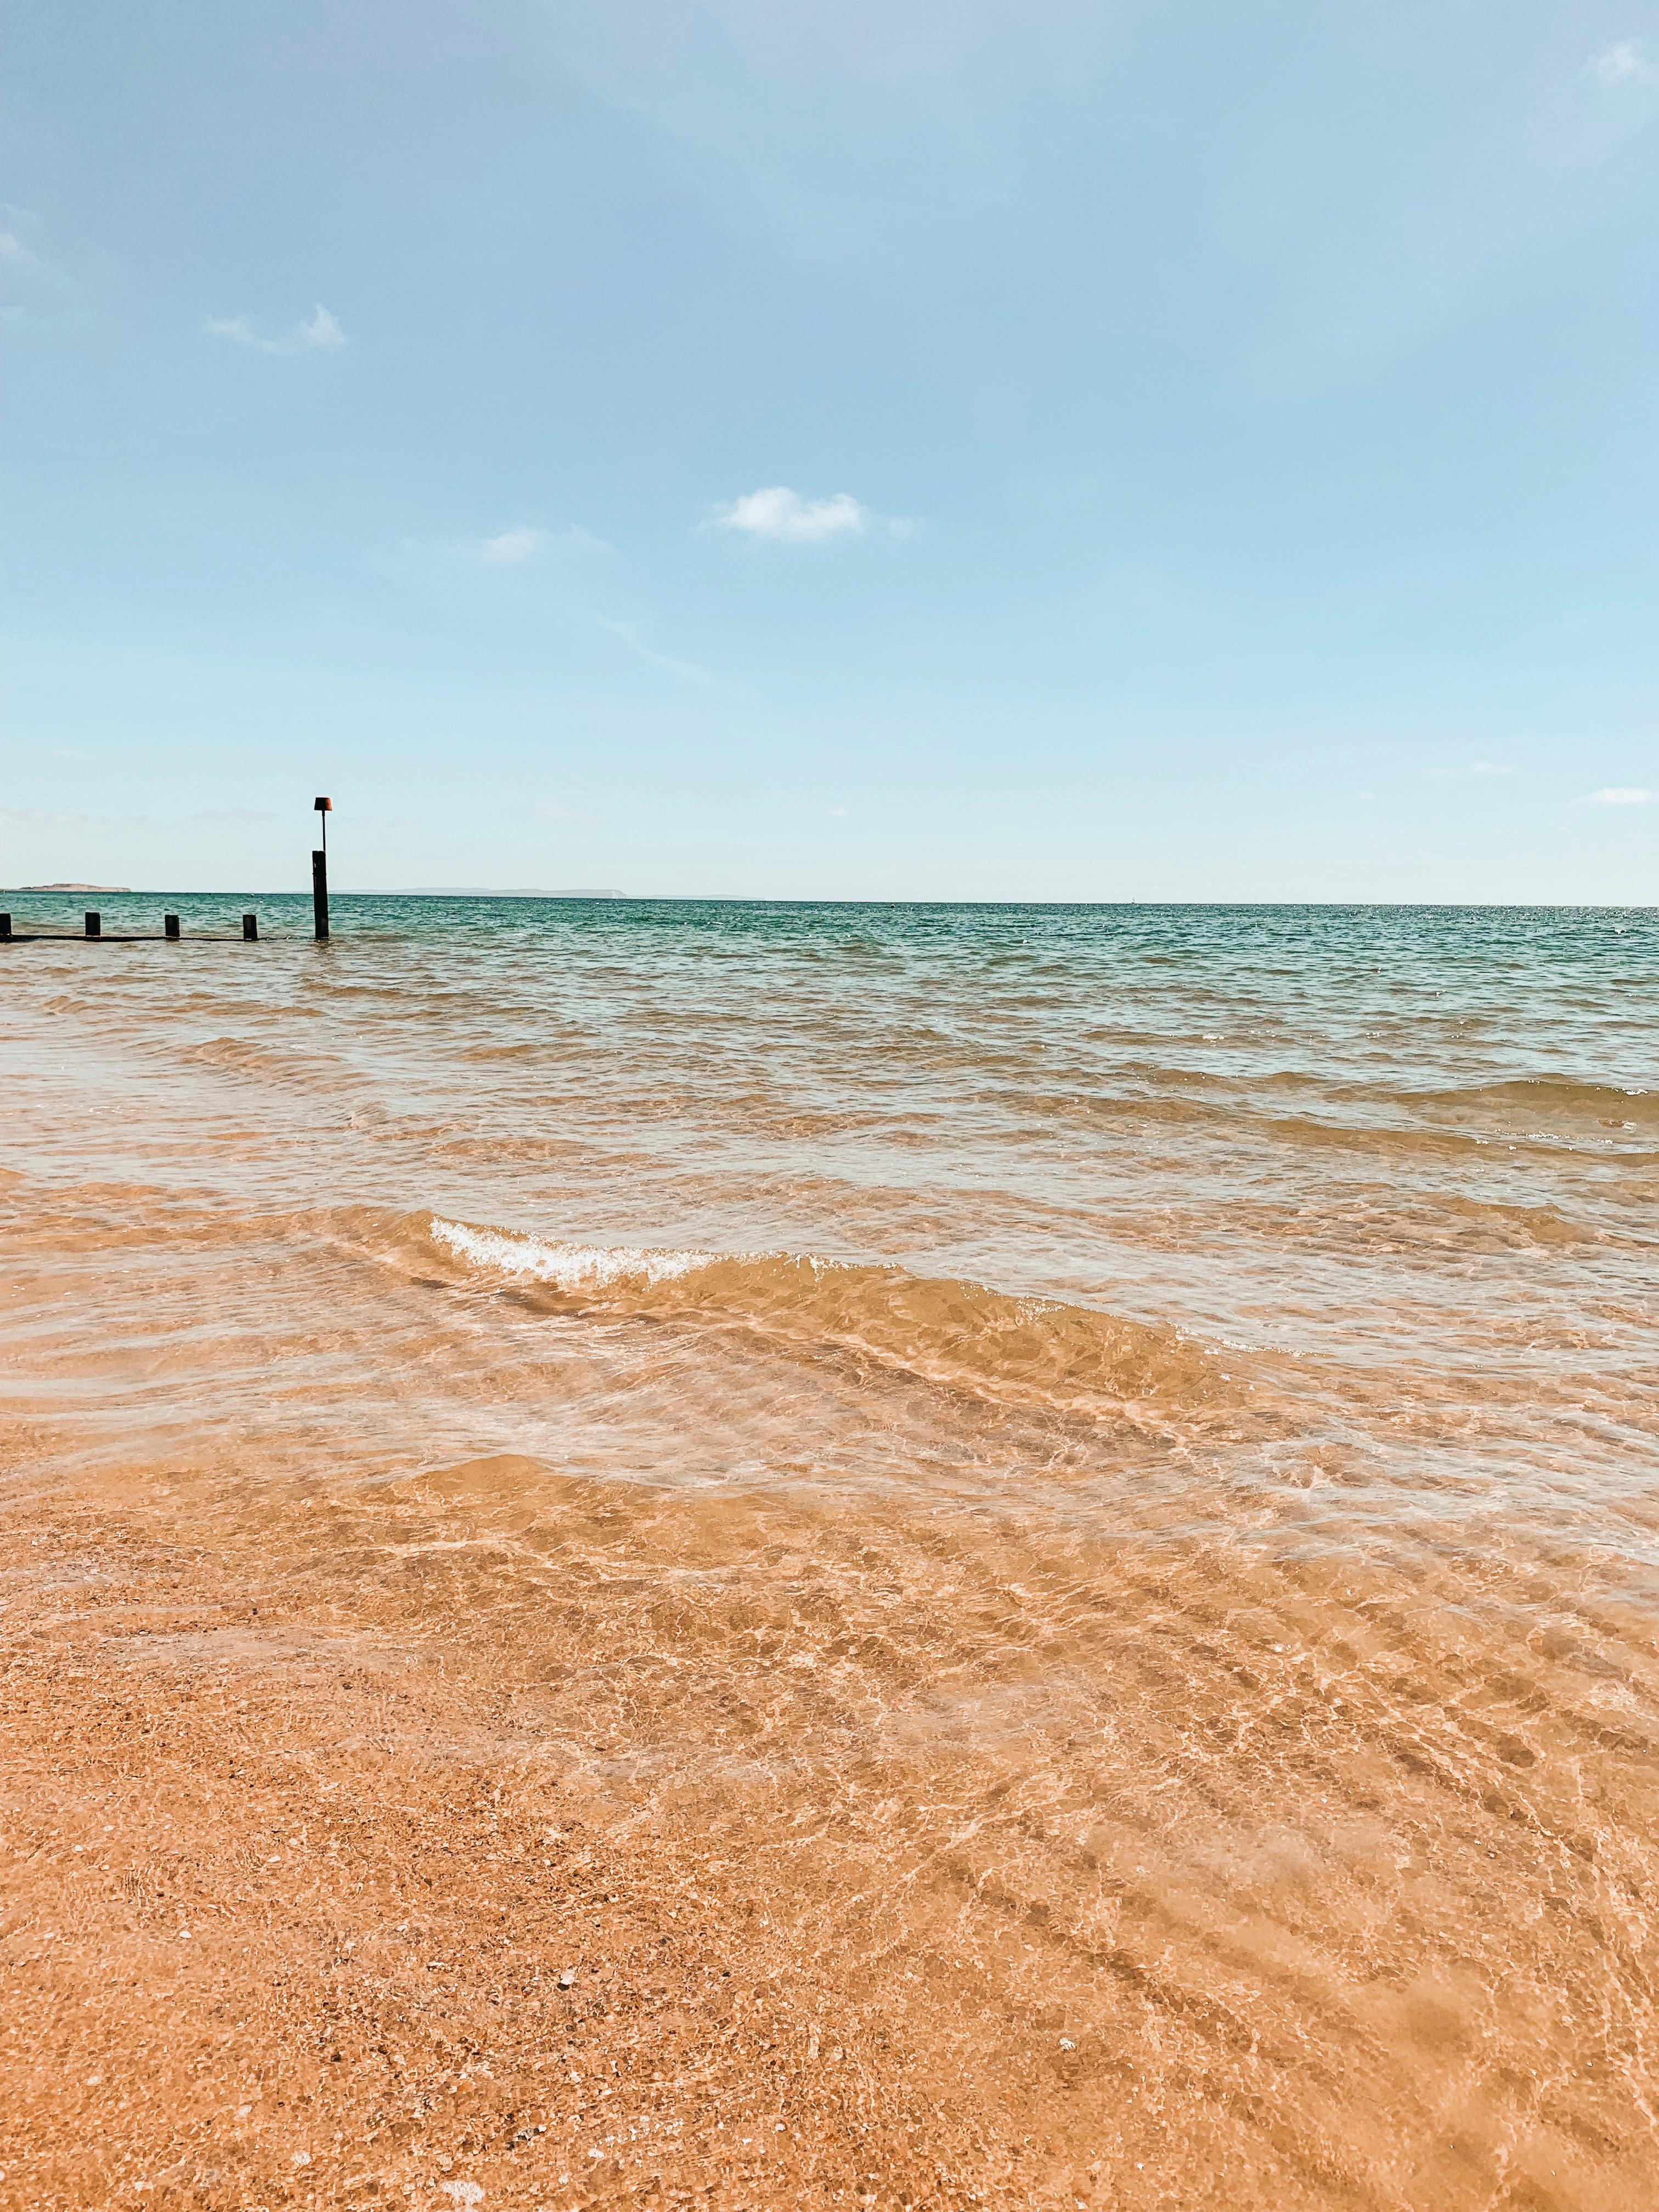 jaye rockett gratitude mindset bournemouth beach summer